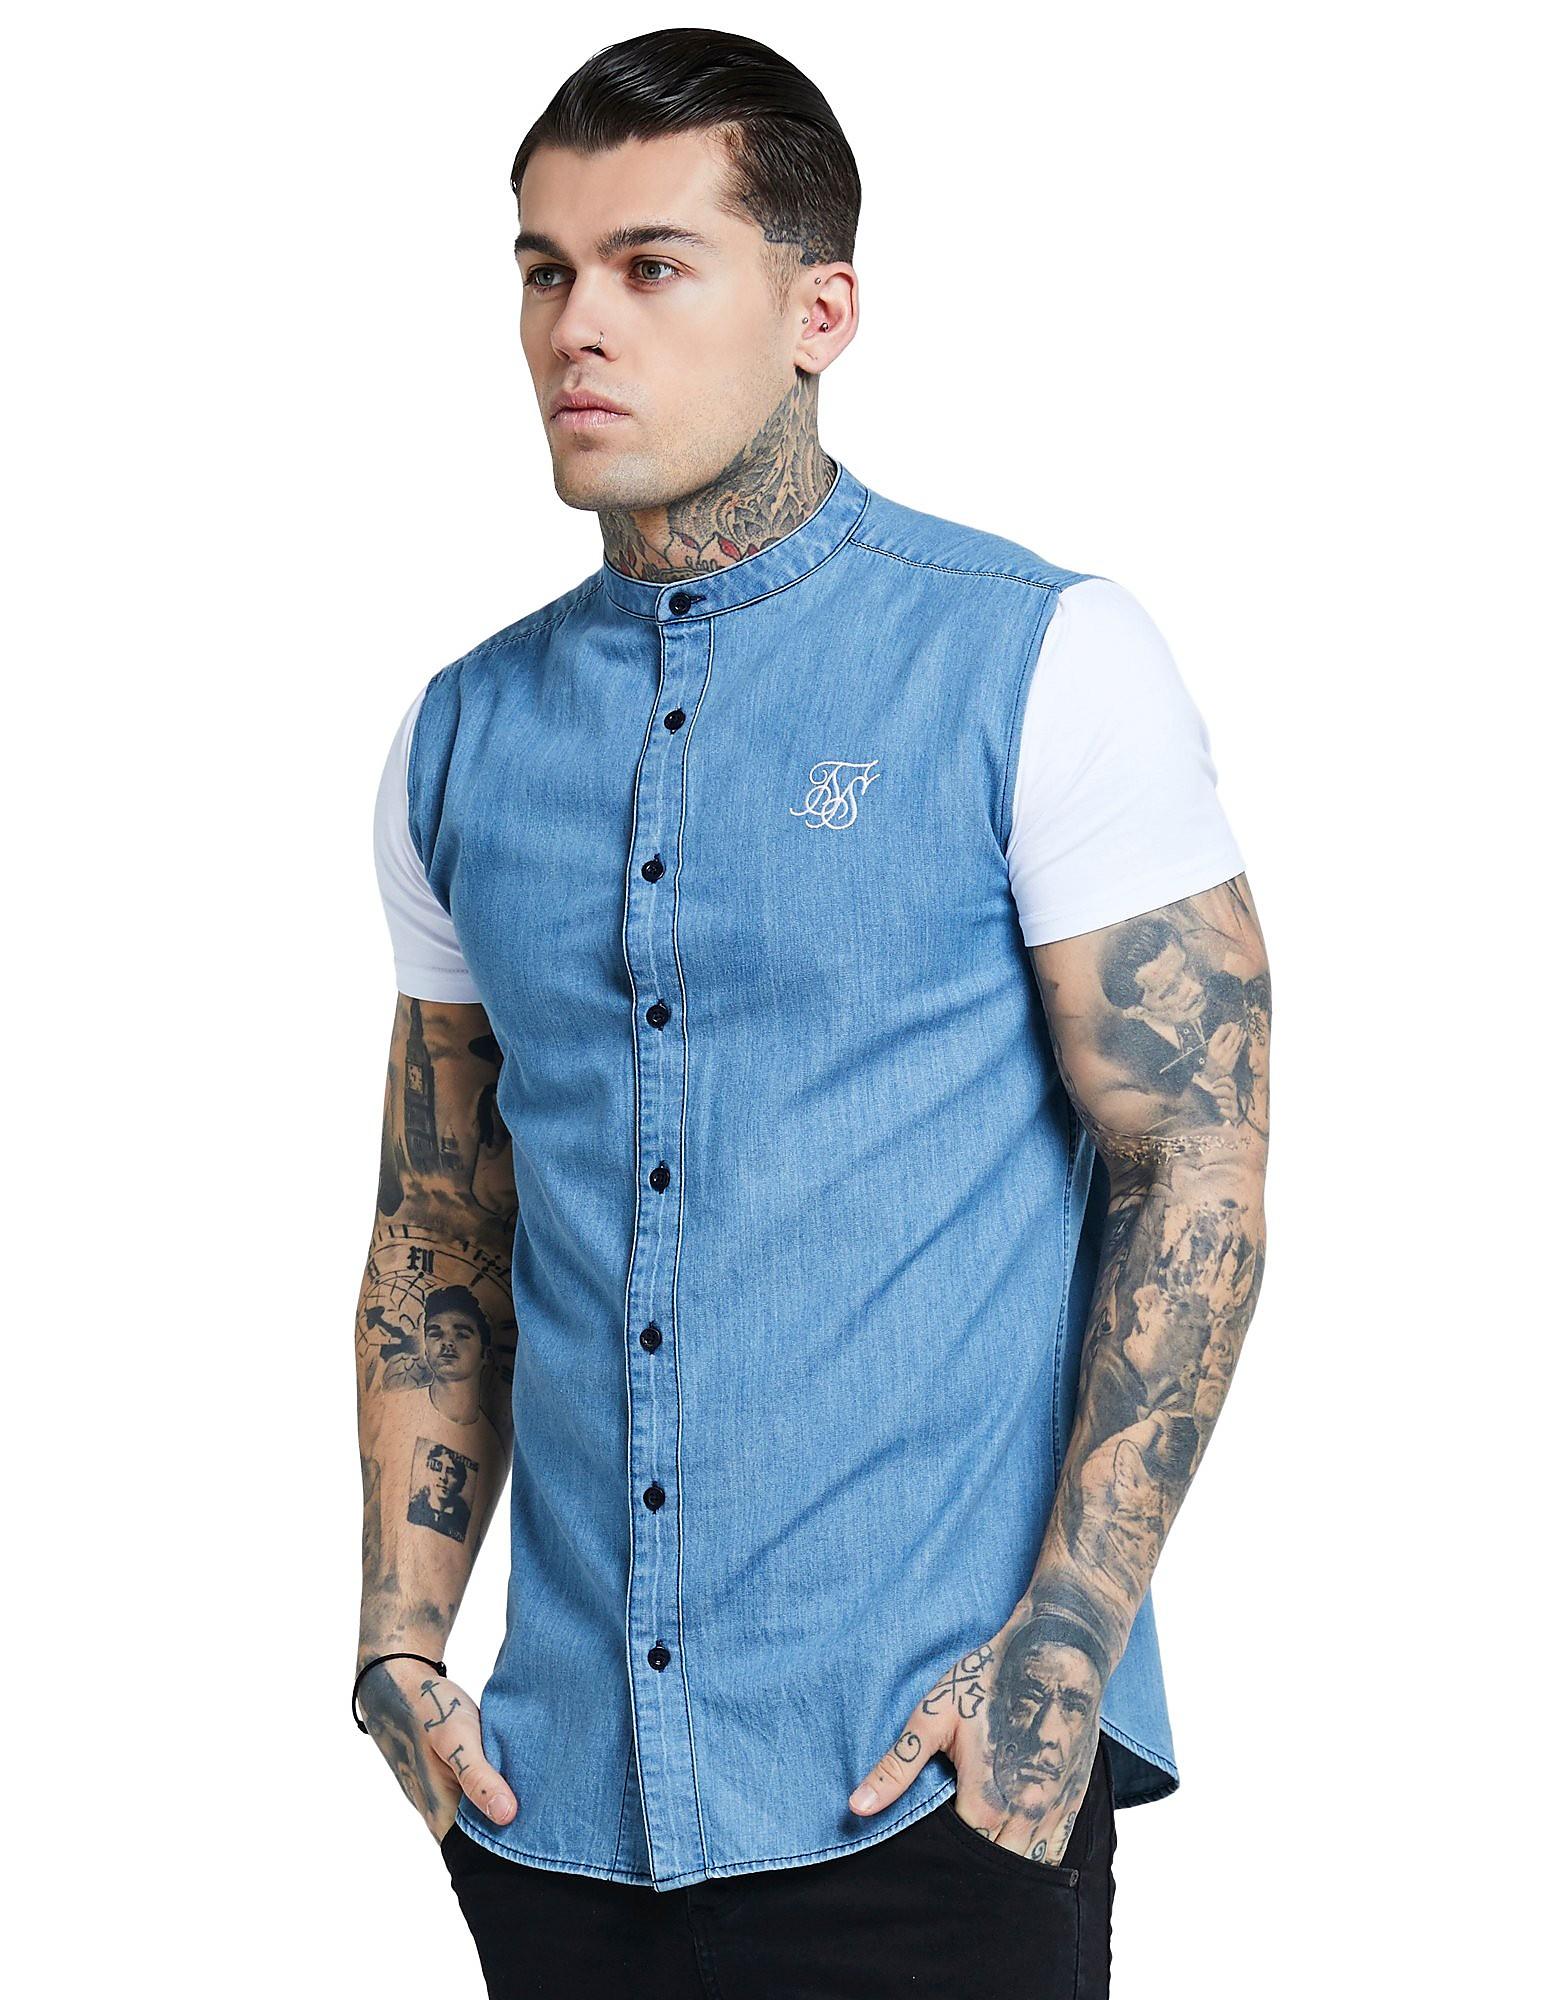 SikSilk Mid Denim Short Sleeve Shirt